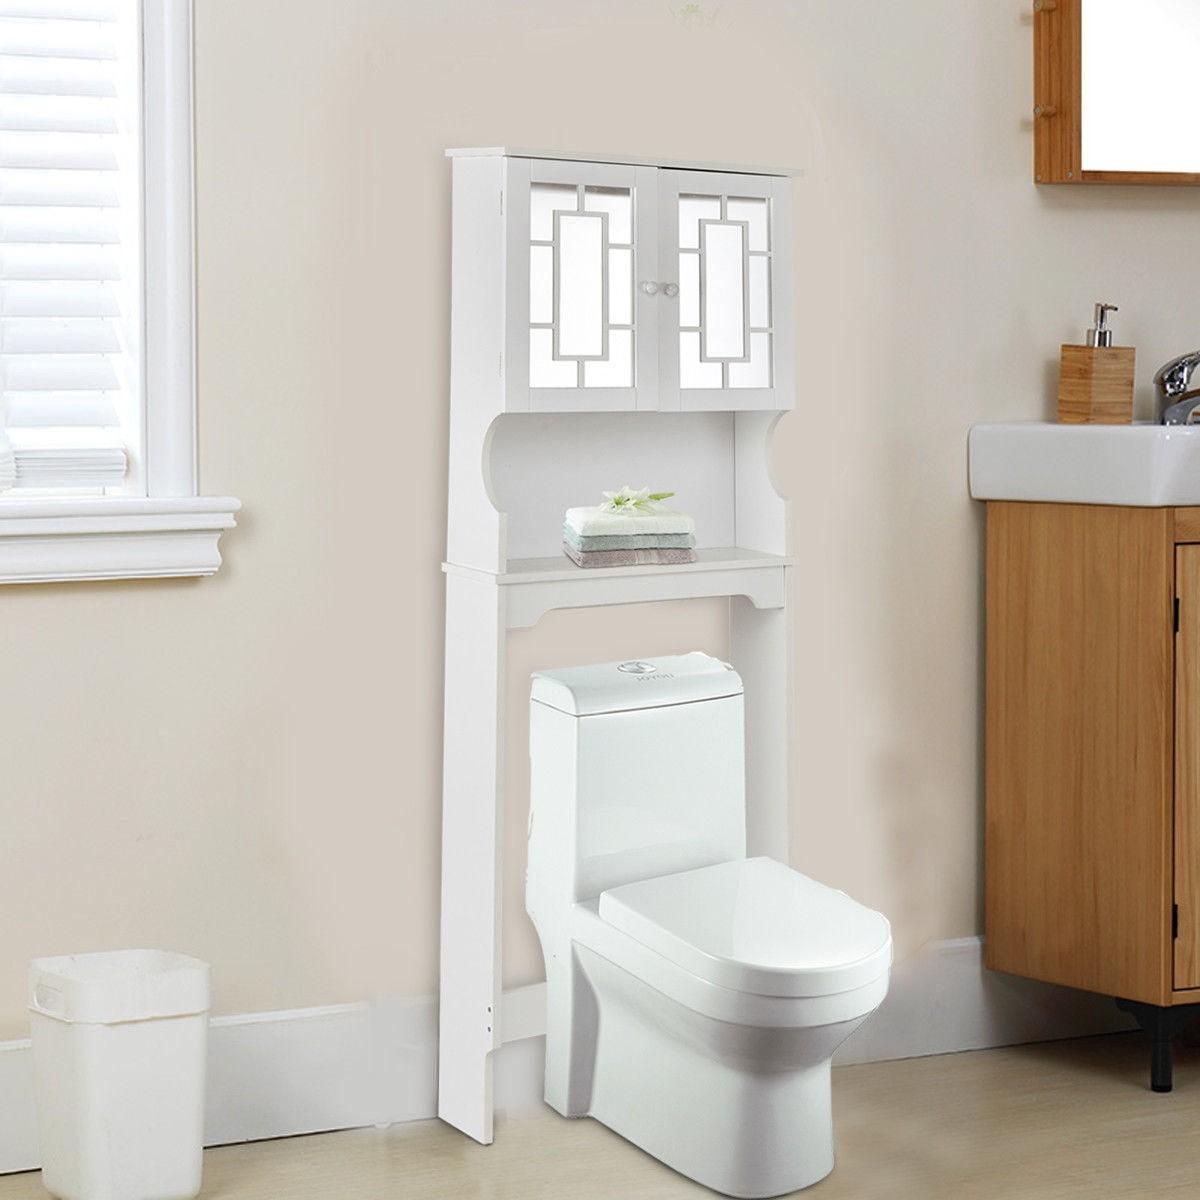 Bathroom Over Toilet Space Saver Storage Cabinet Shelf